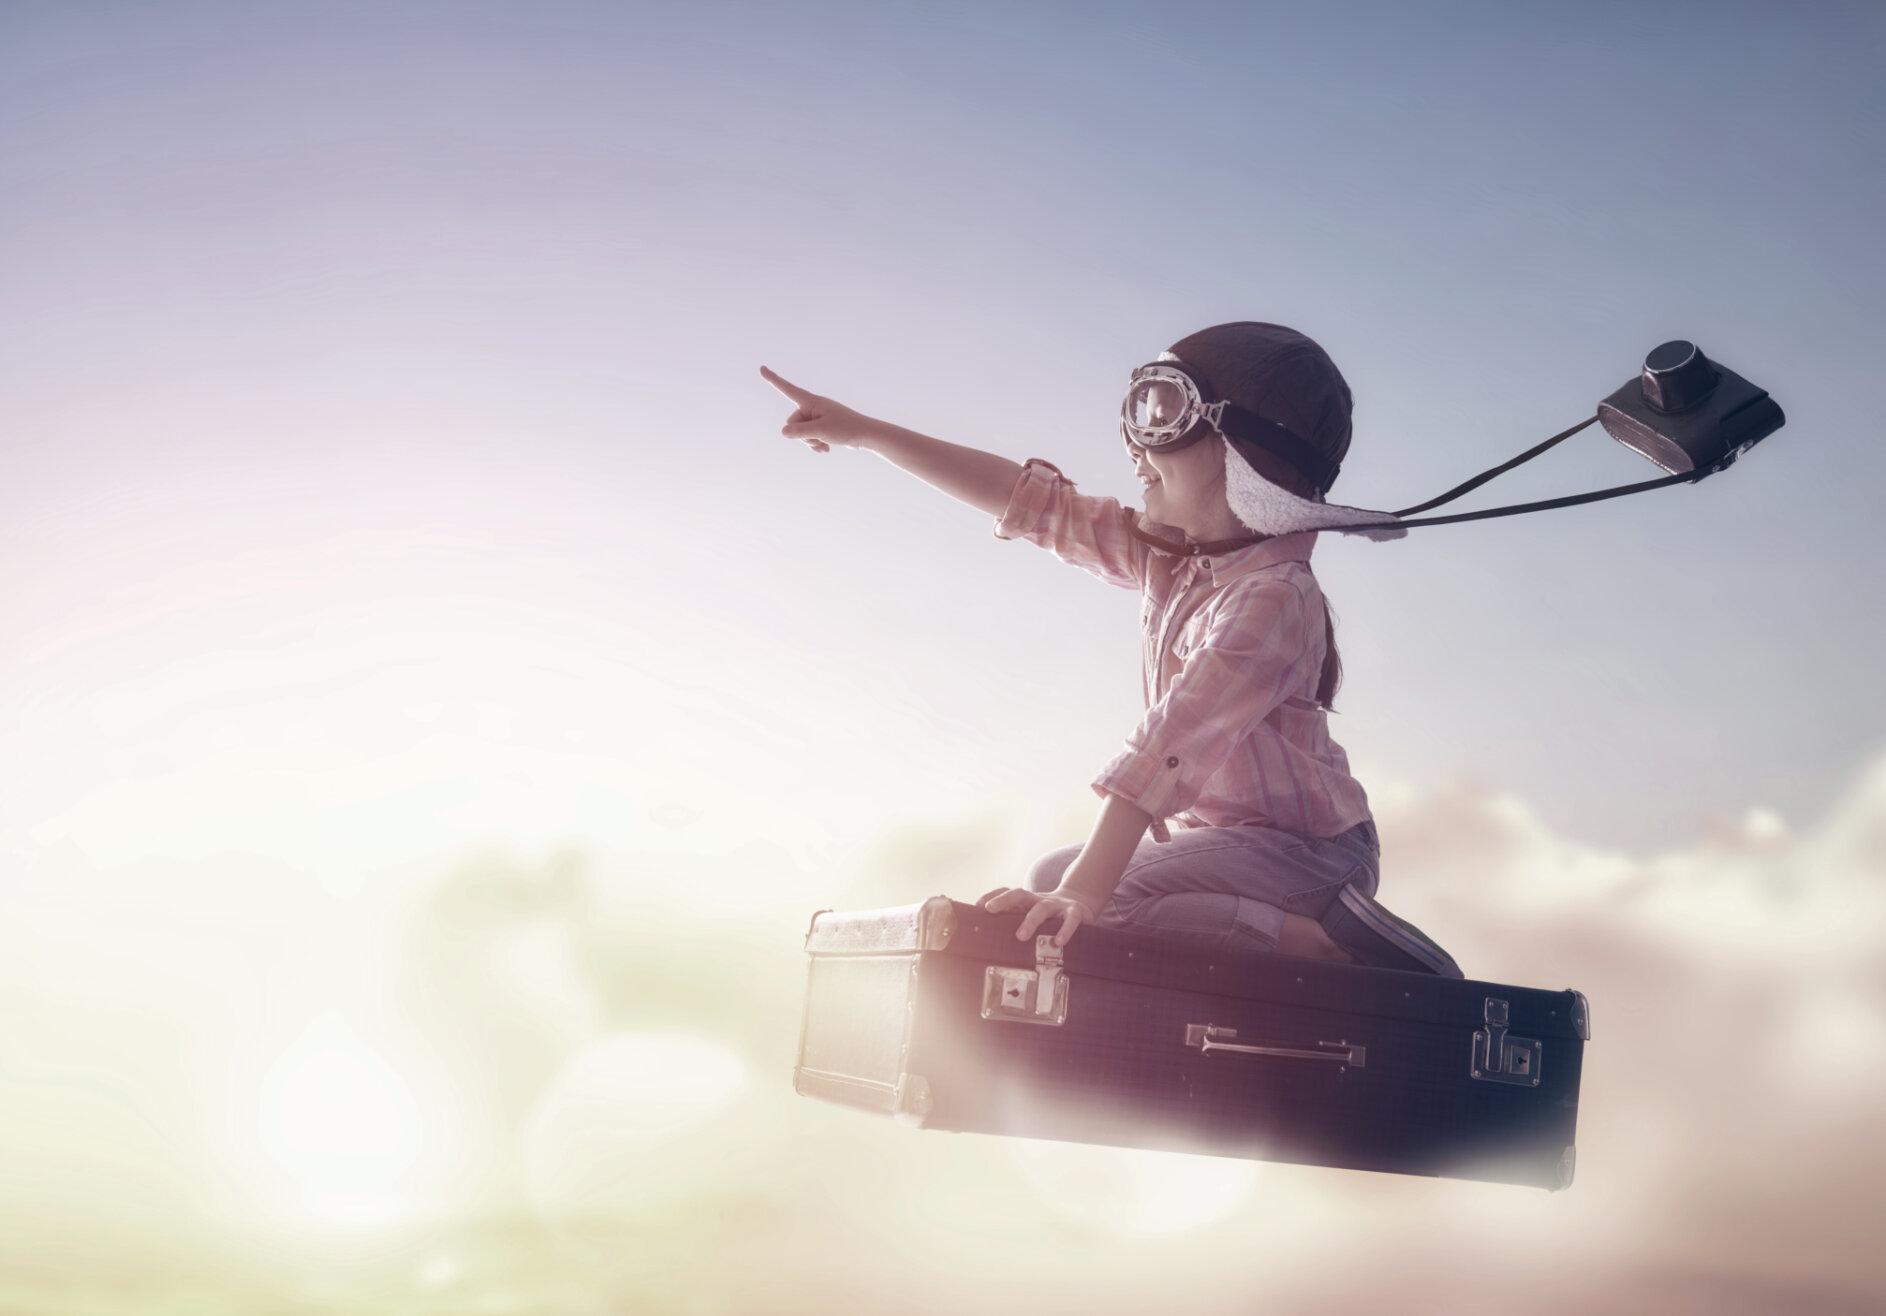 Vertikal Helse 400379983 child flying suitcase